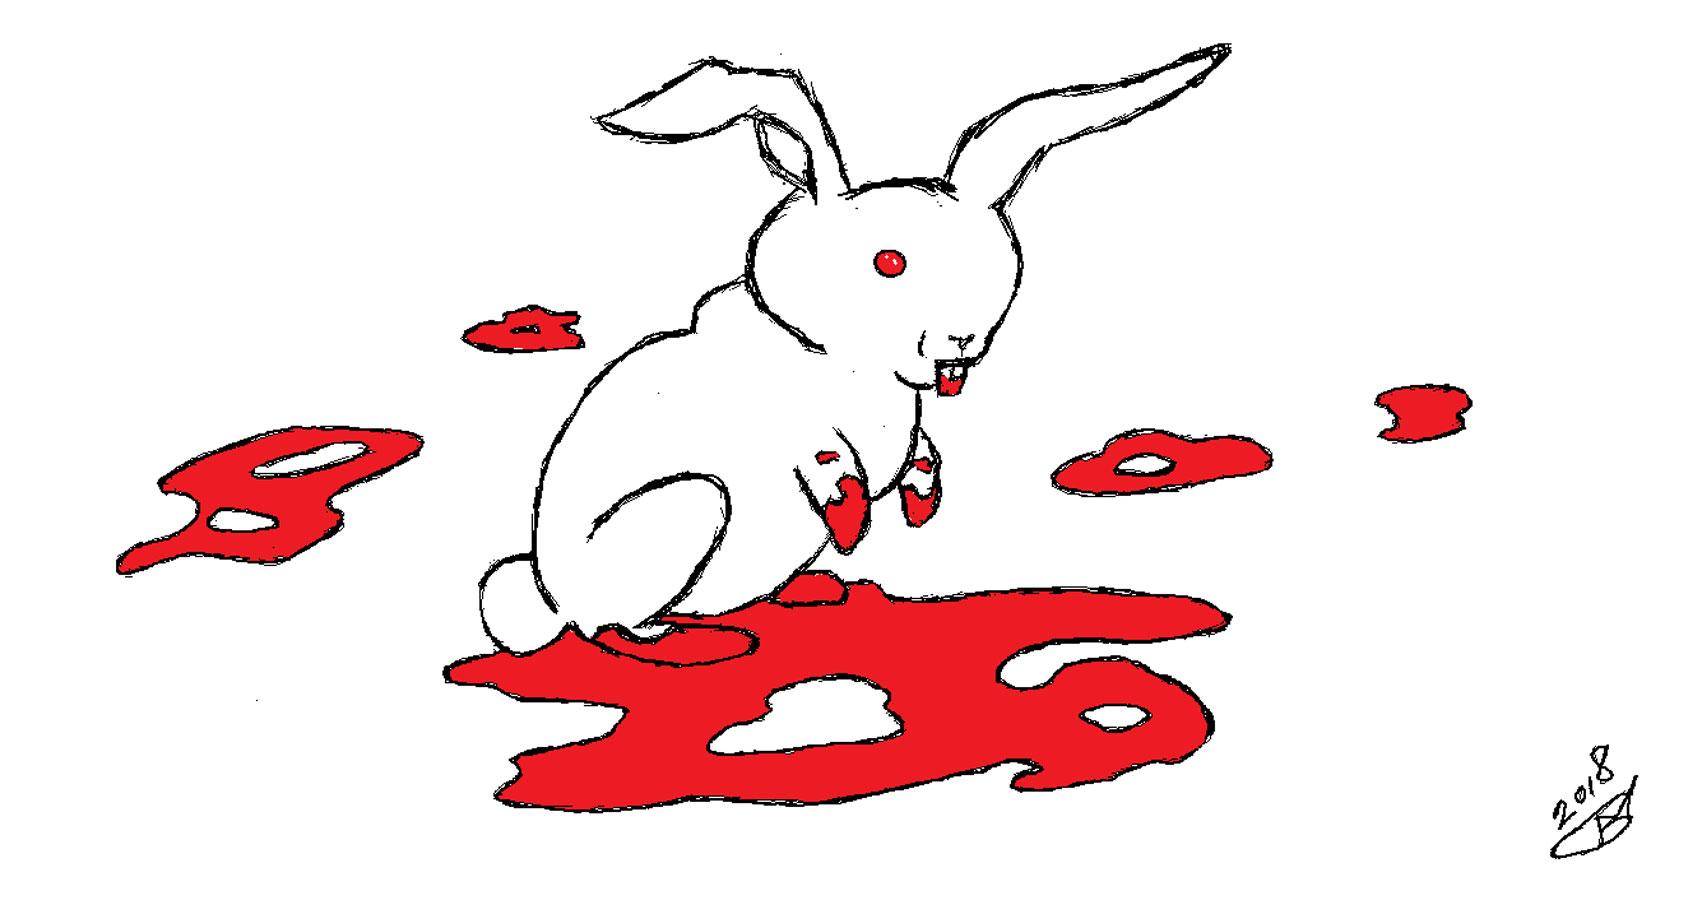 Killer Rabbit written by Robyn MacKinnon at Spillwords.com